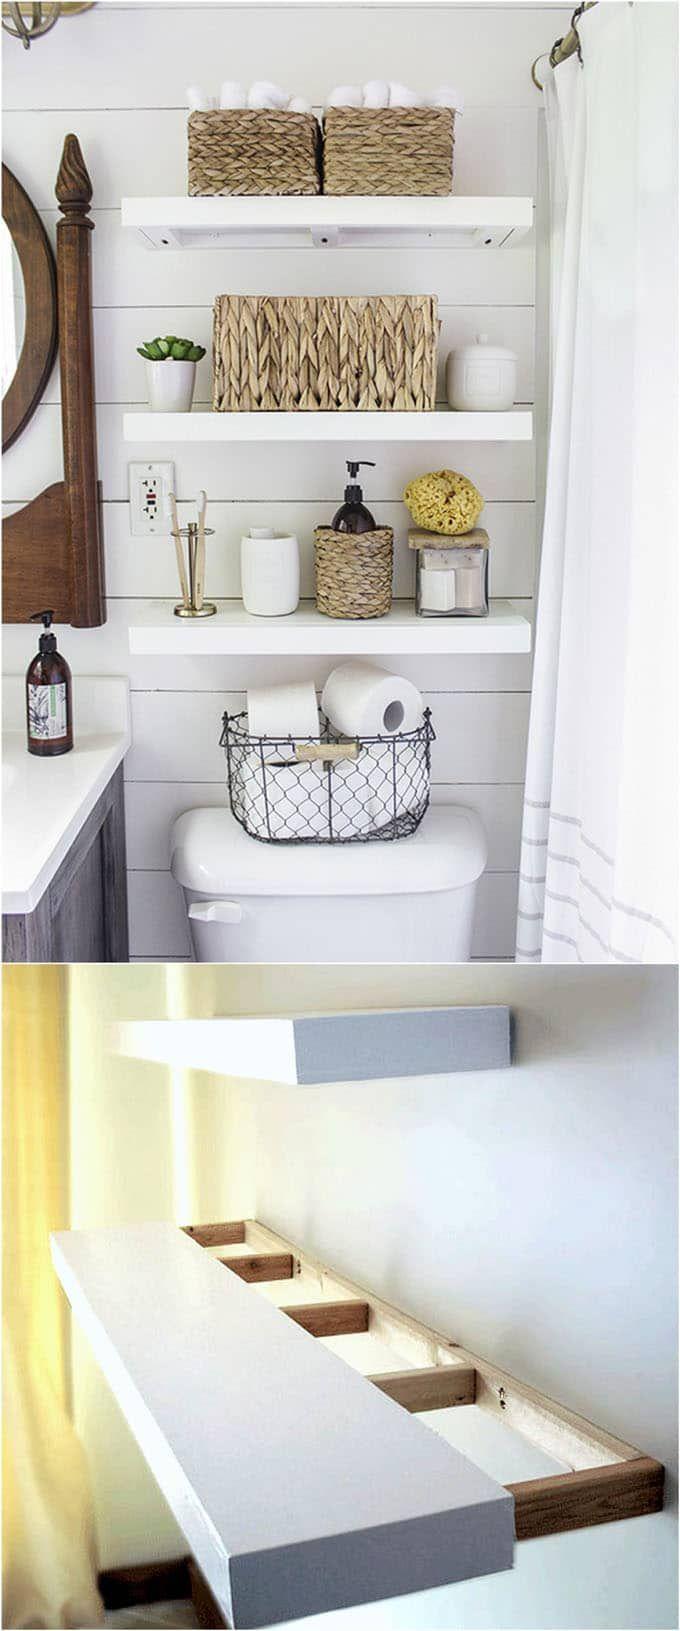 16 Easy and Stylish DIY Floating Shelves & Wall Shelves   Design ...